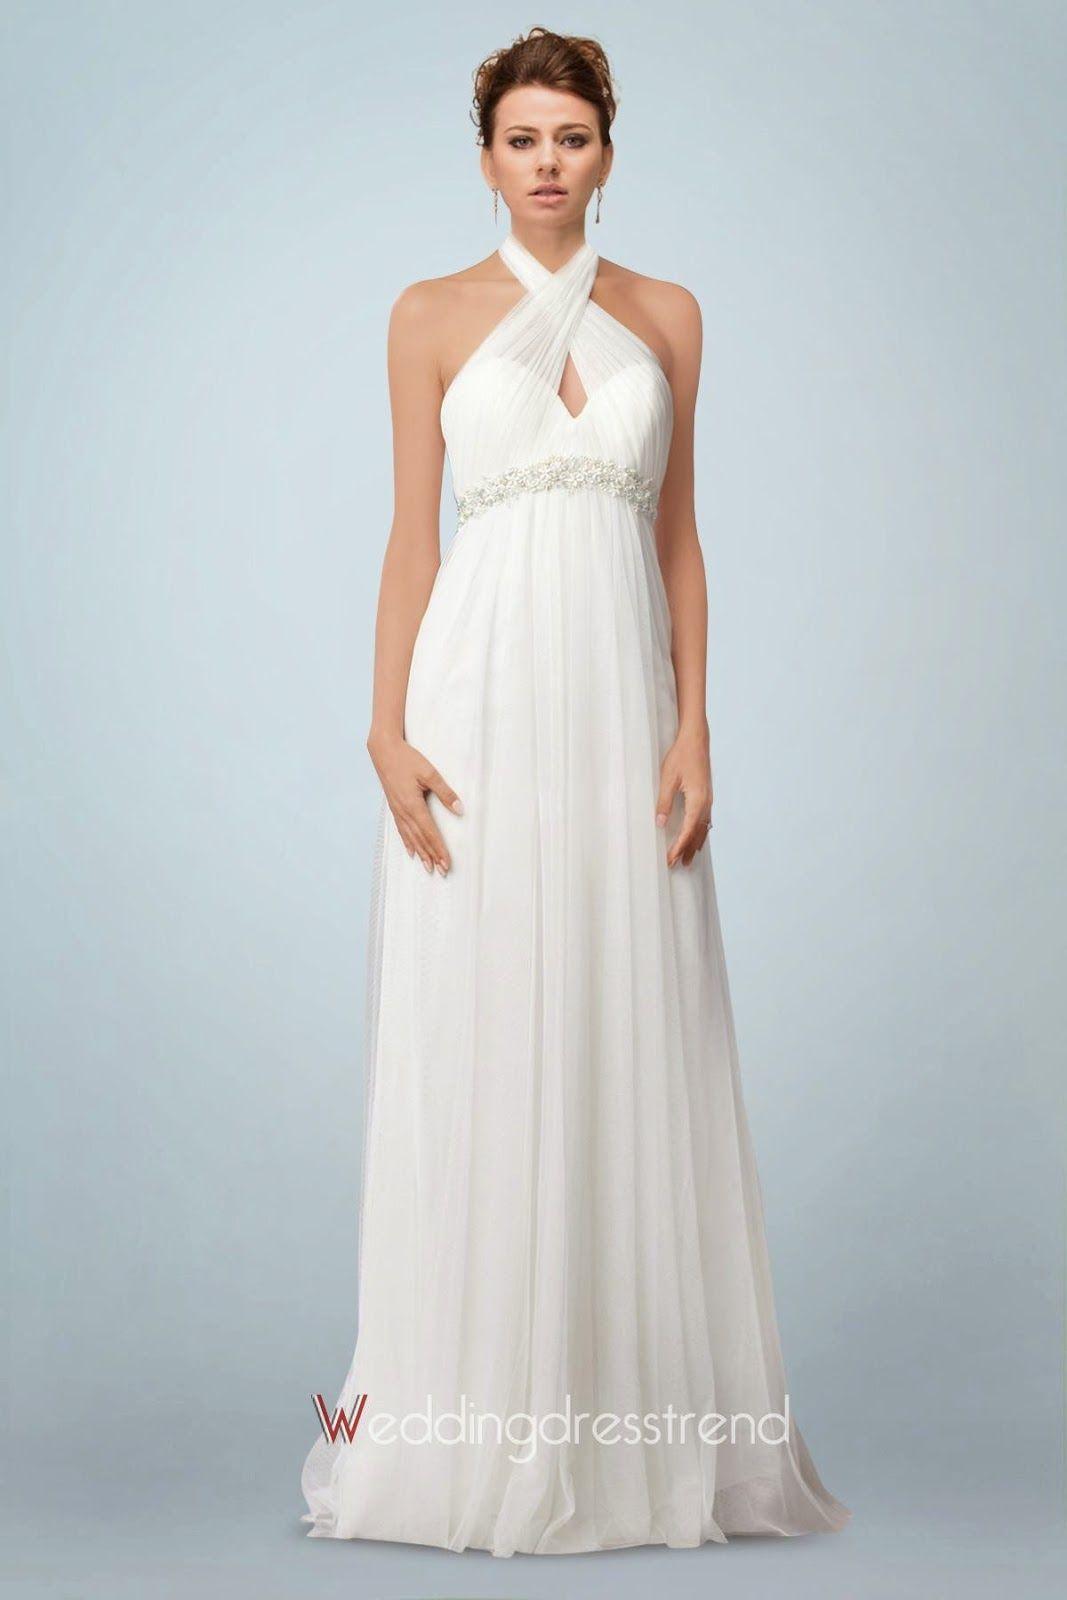 Lindos Vestidos de novia para embarazadas | Tendencias | Vestidos ...